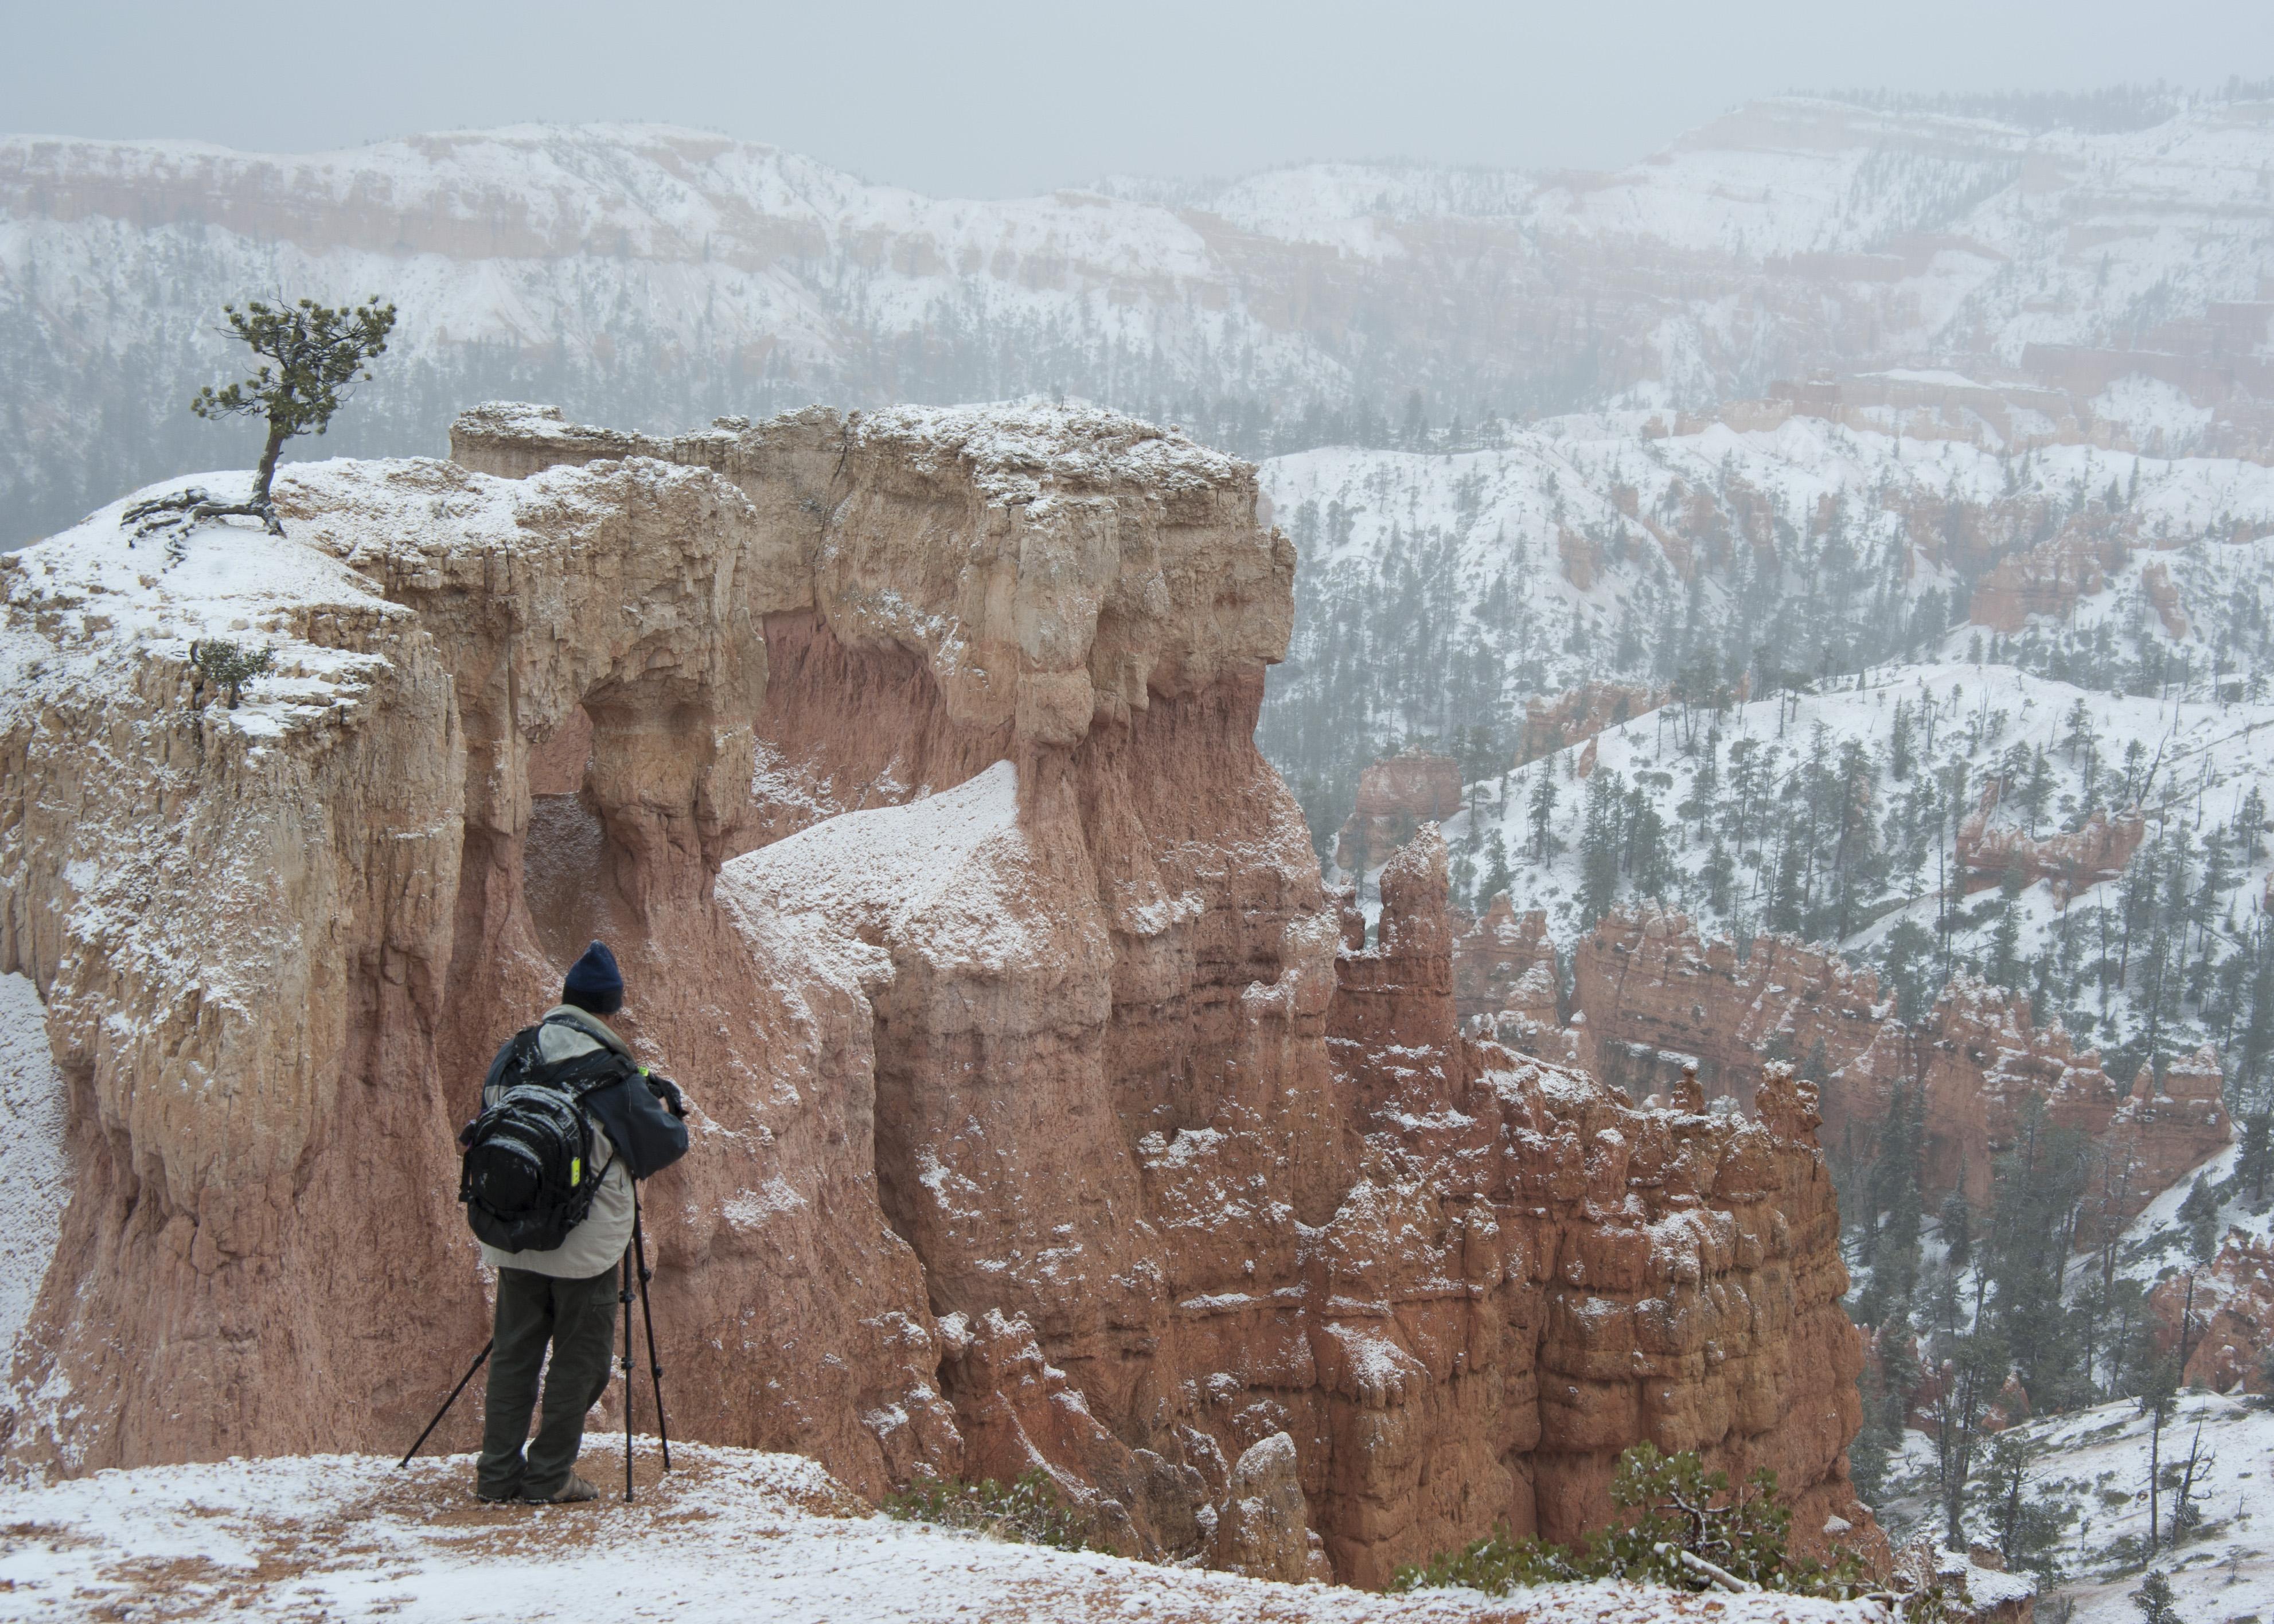 #snow, #bryce, #brycecanyon, #hoodoo, #careful, #cliff, #dontfall, #tripod